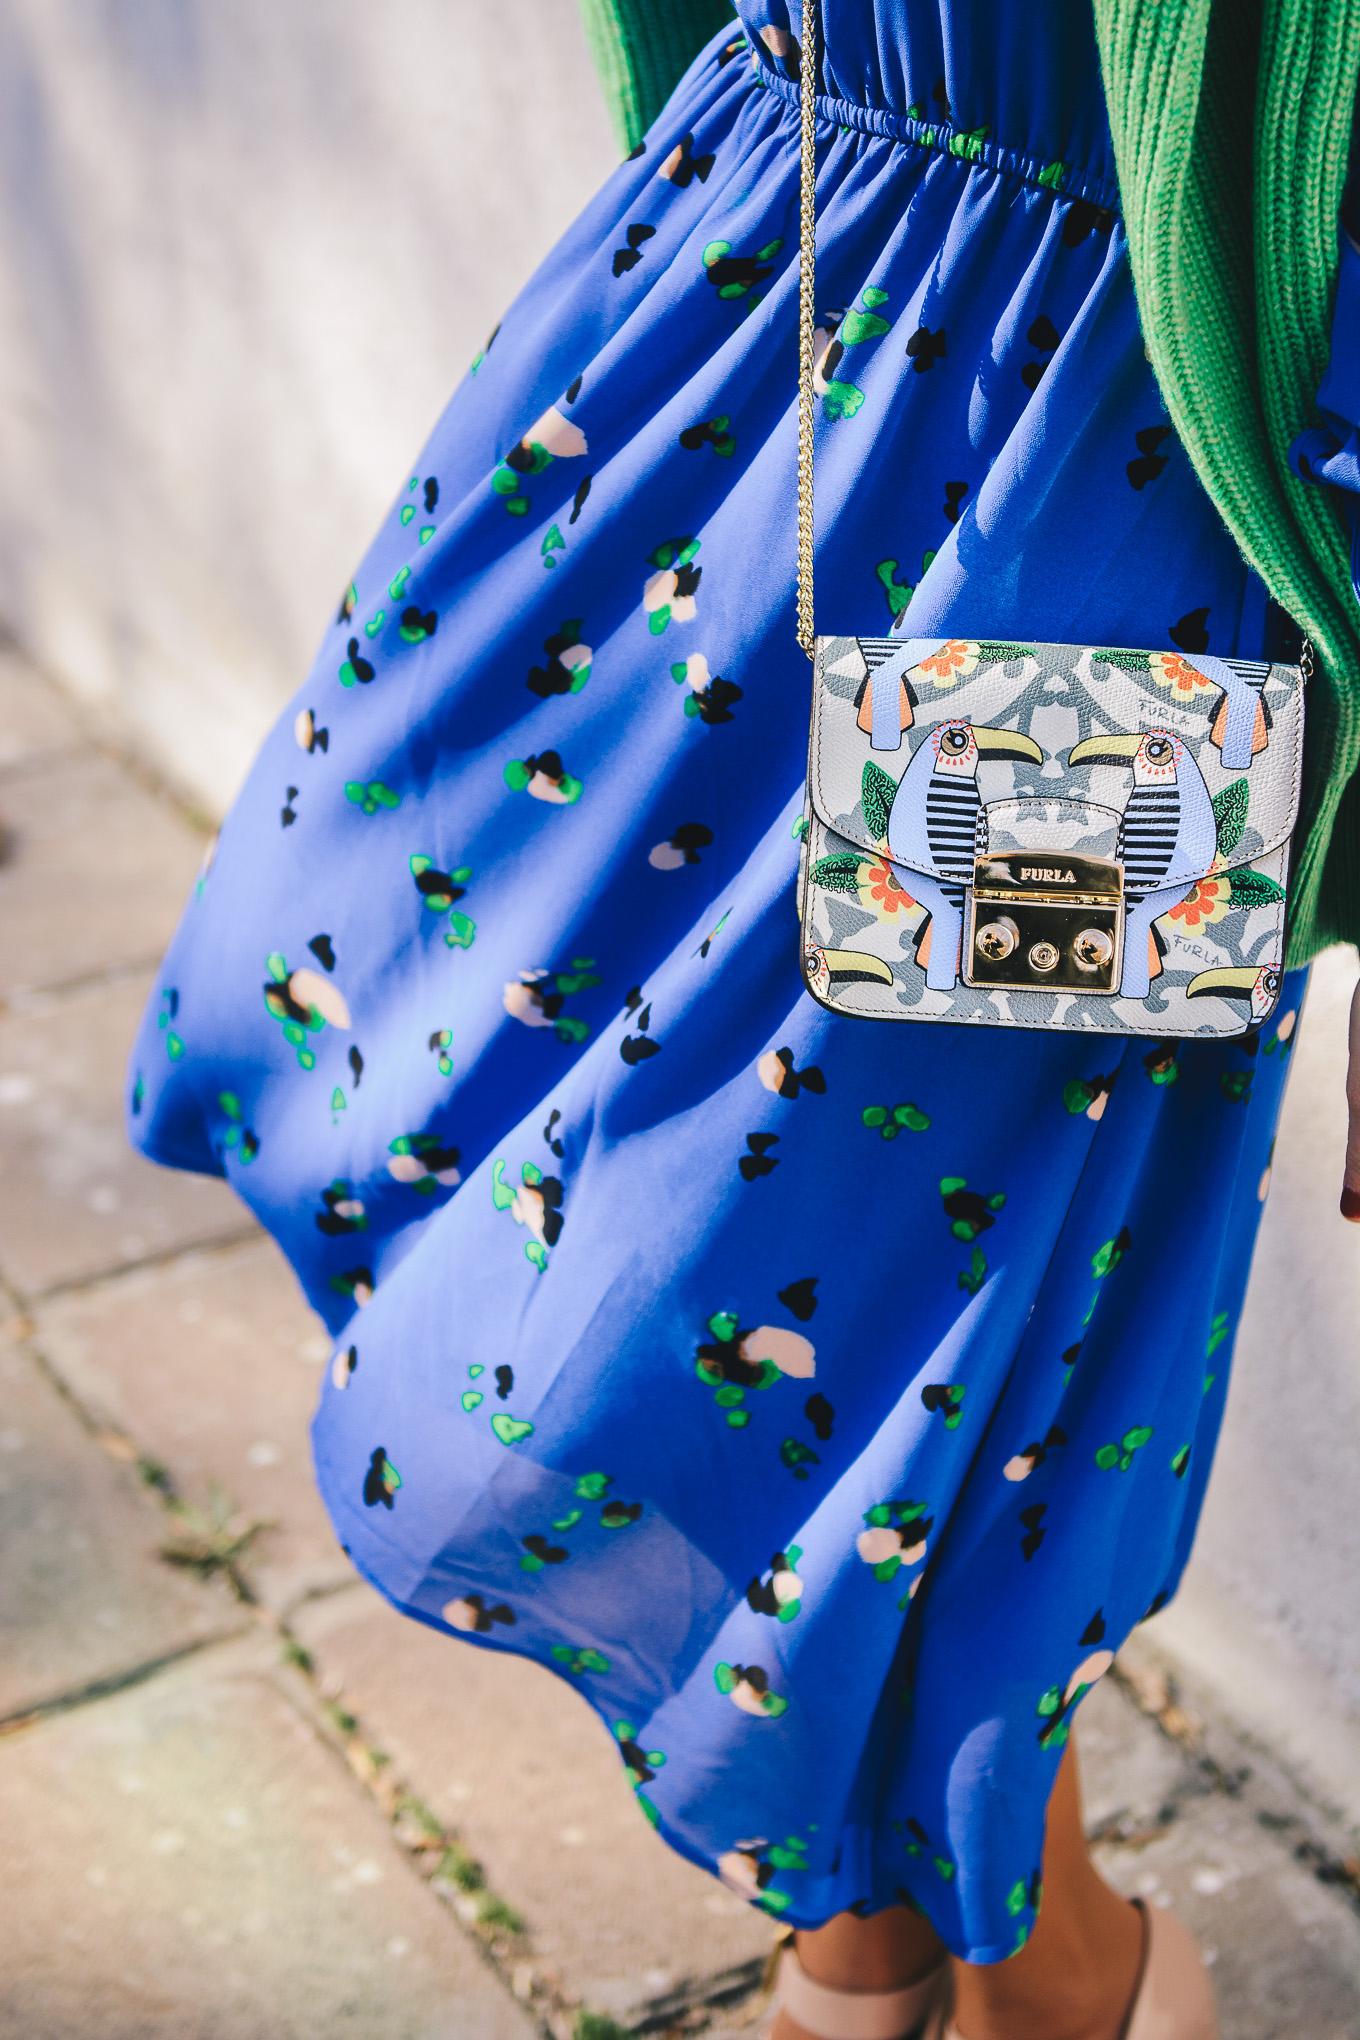 My girly furla handbag